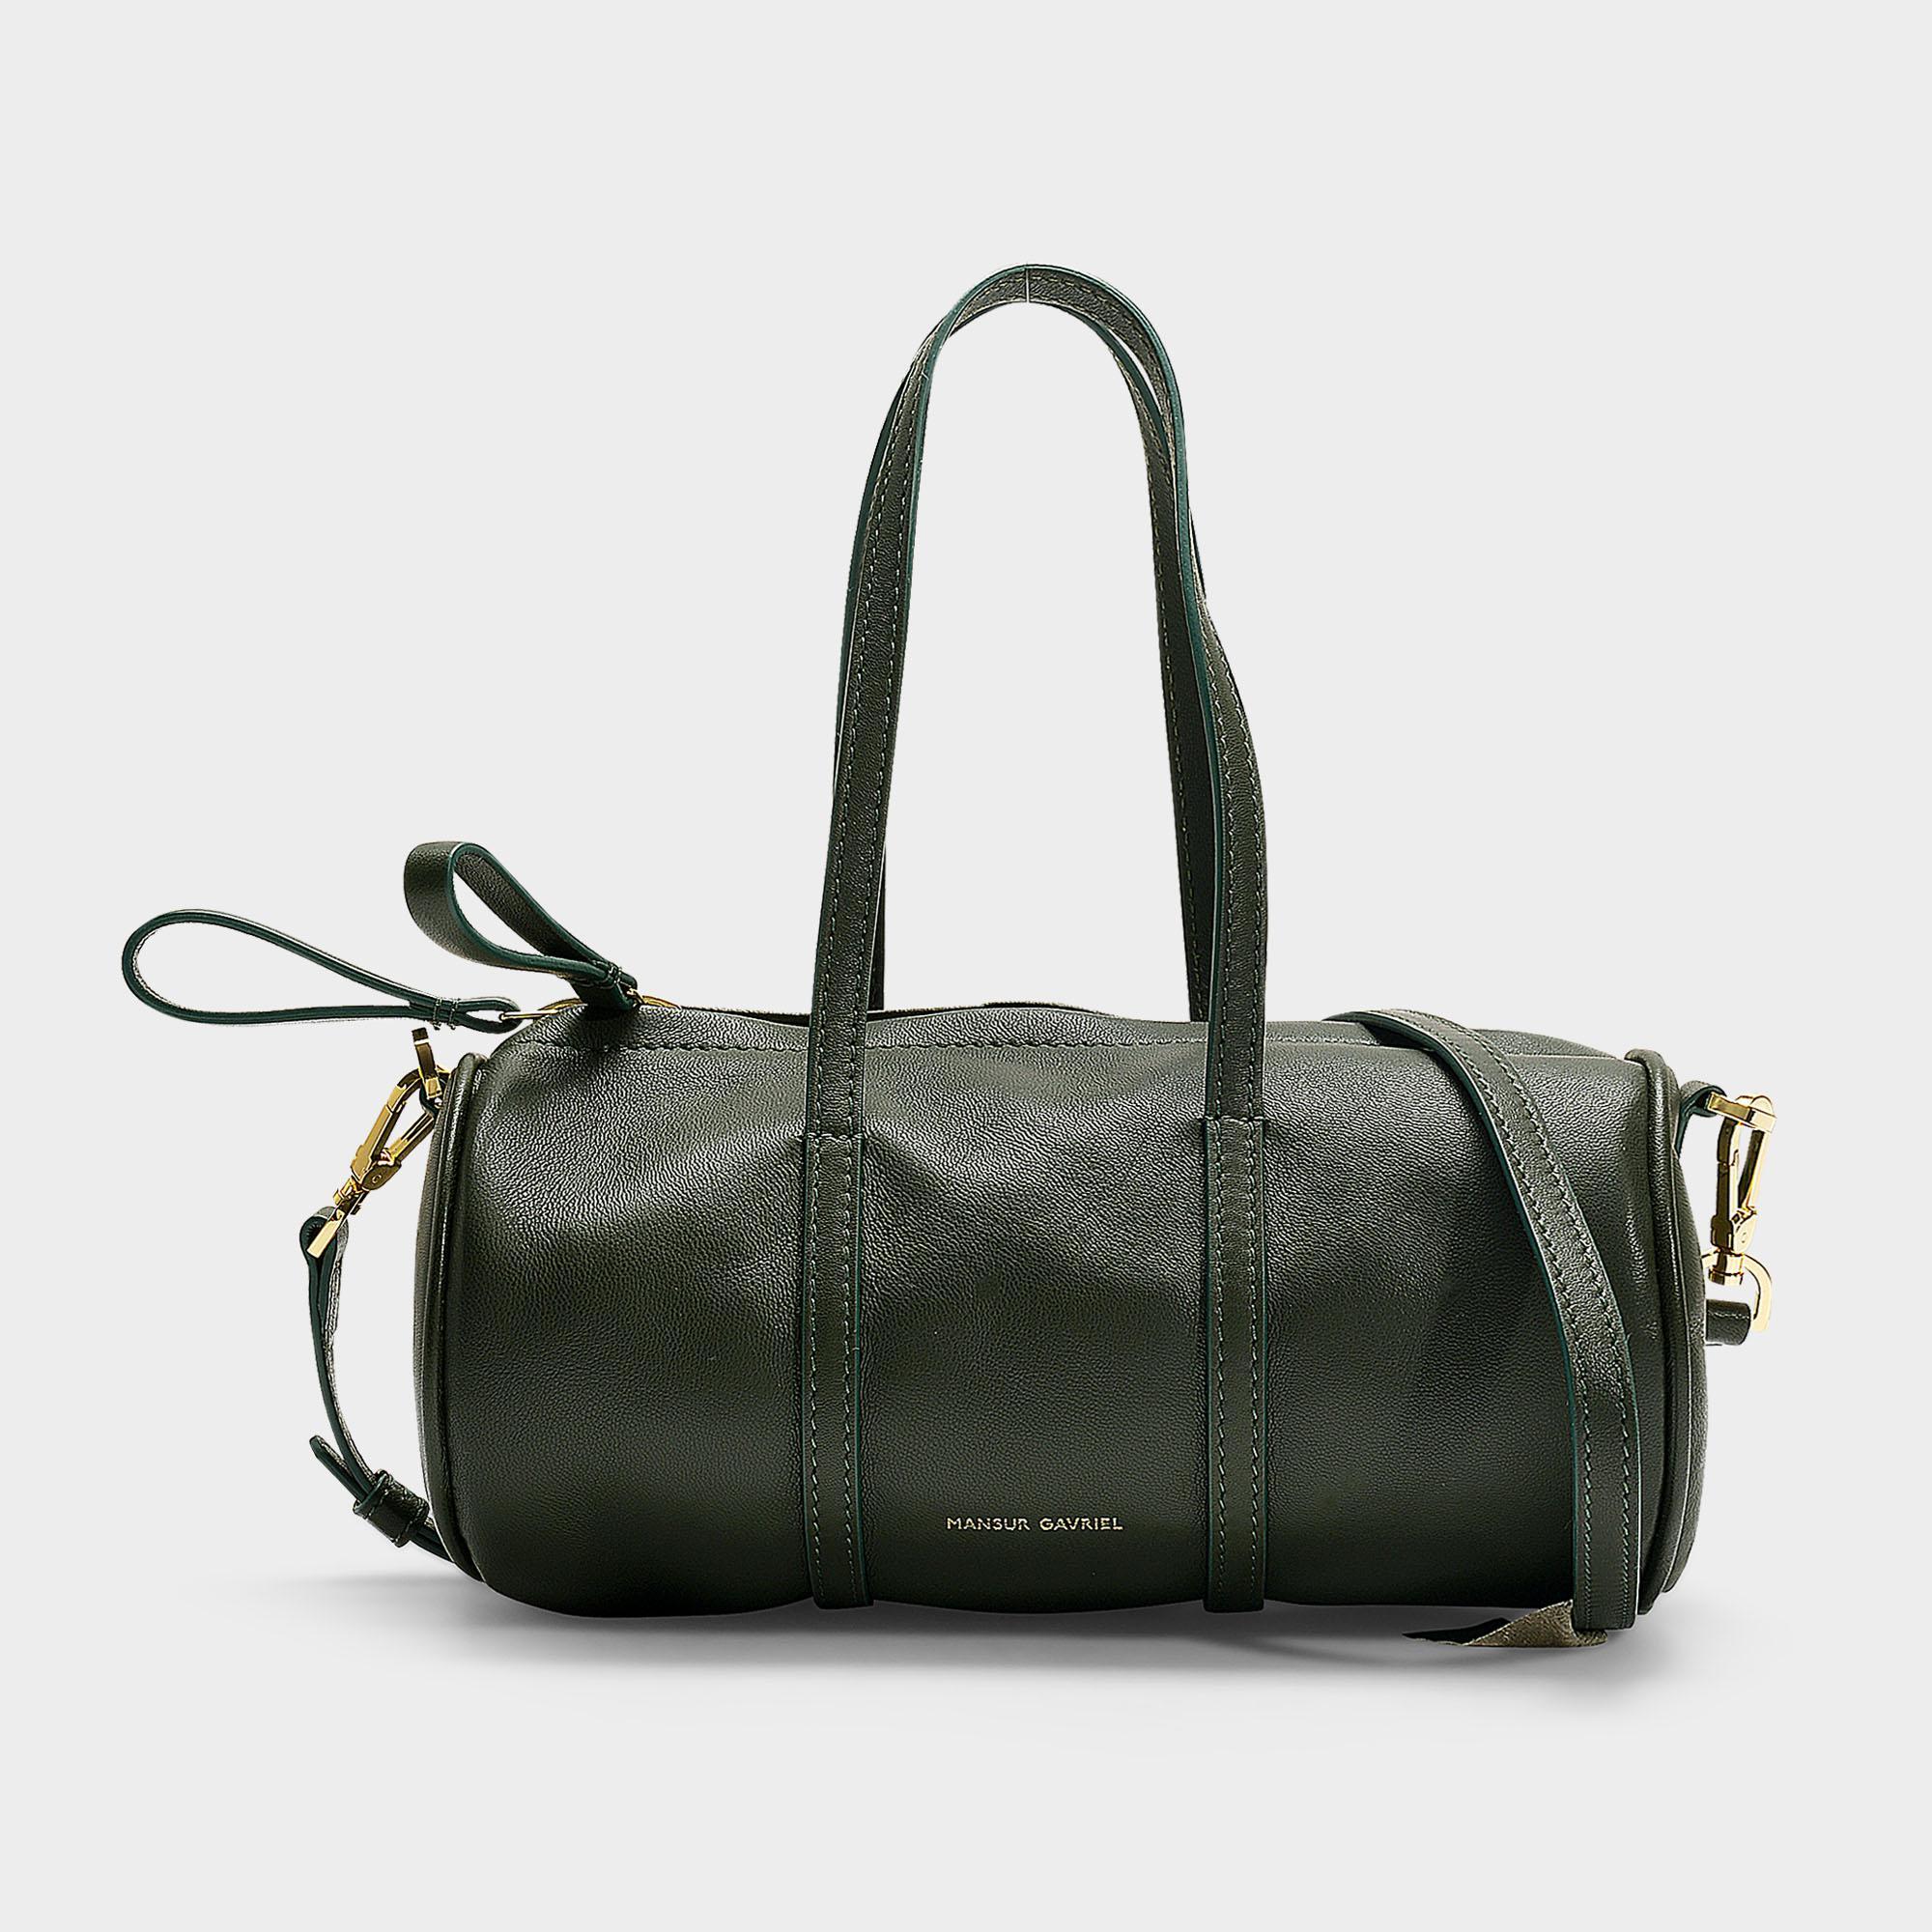 631956b0883a Mansur Gavriel - Green Mini Gym Bag In Pink Calfskin - Lyst. View fullscreen